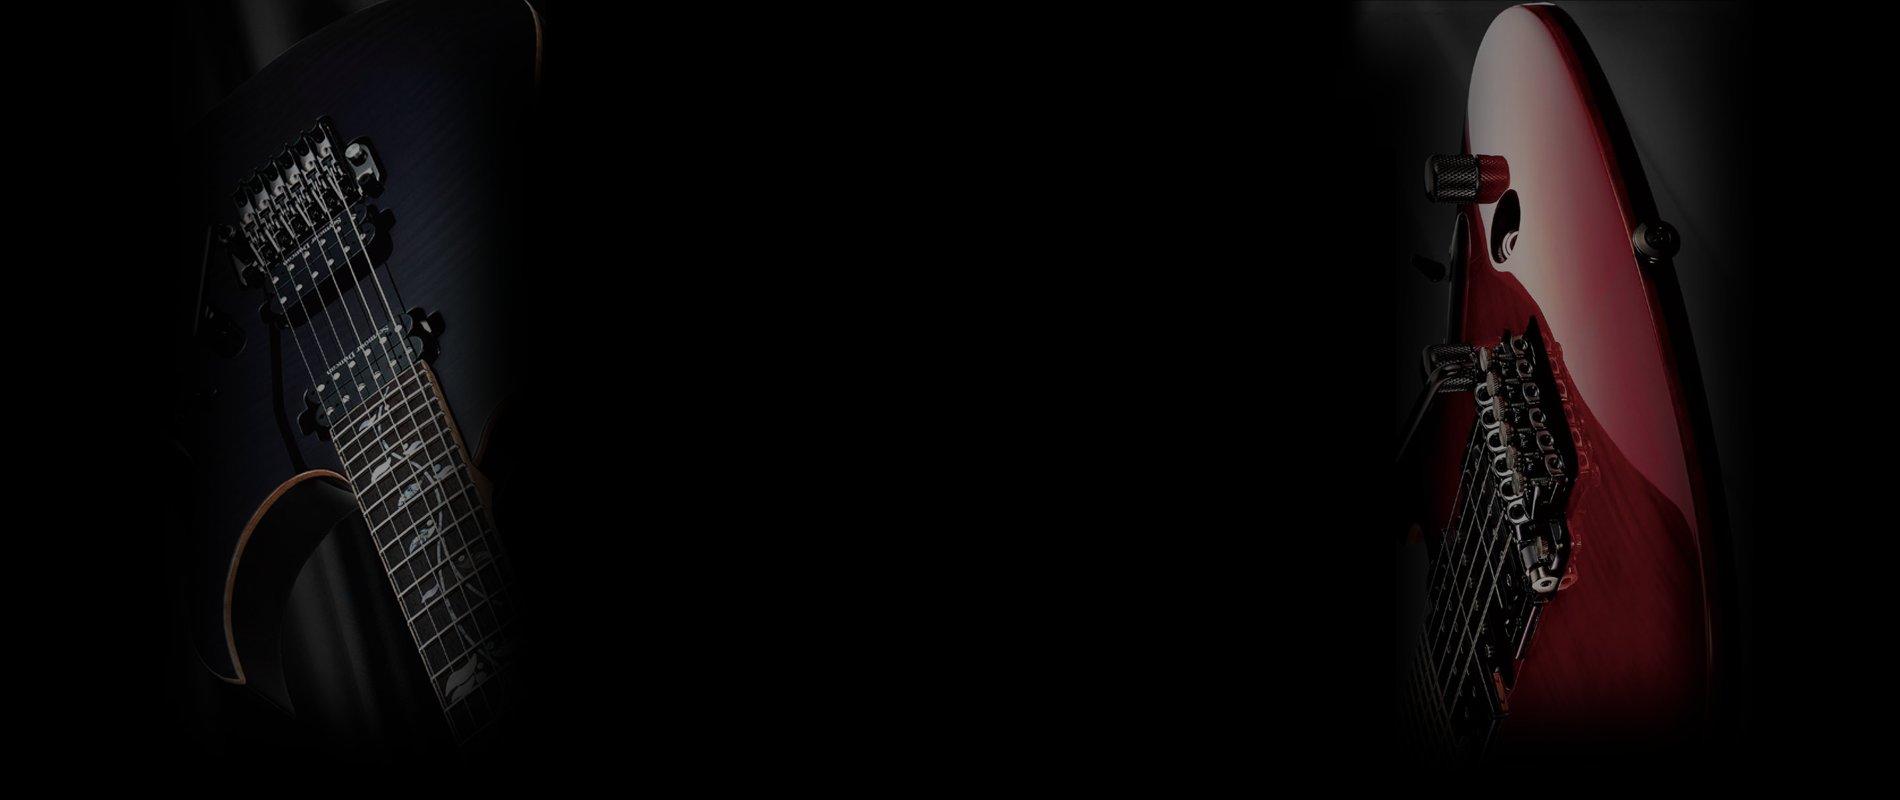 Ibanez S570b Wiring Diagram